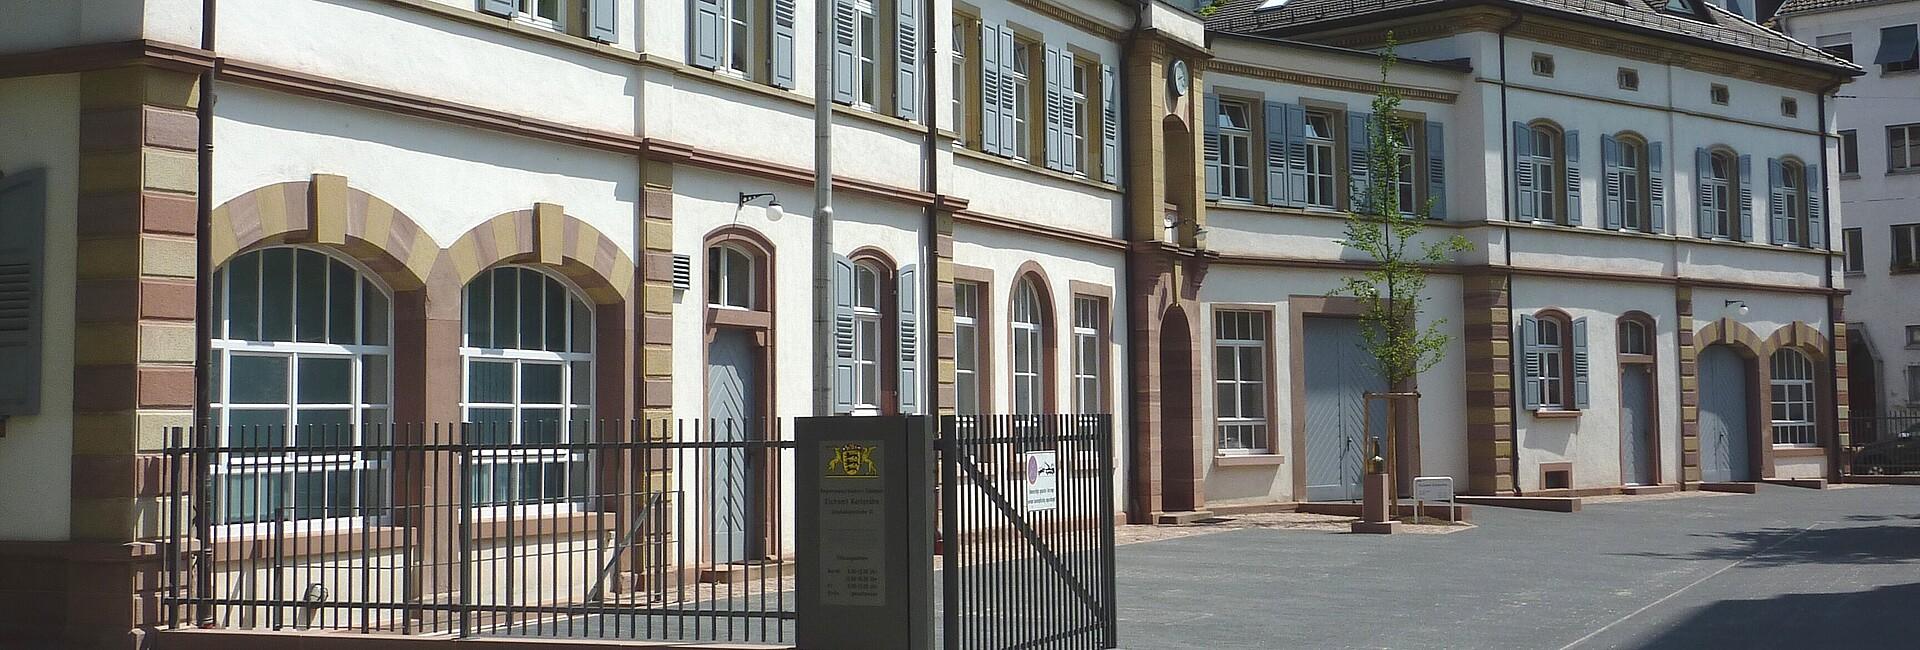 Karlsruhe Tübingen